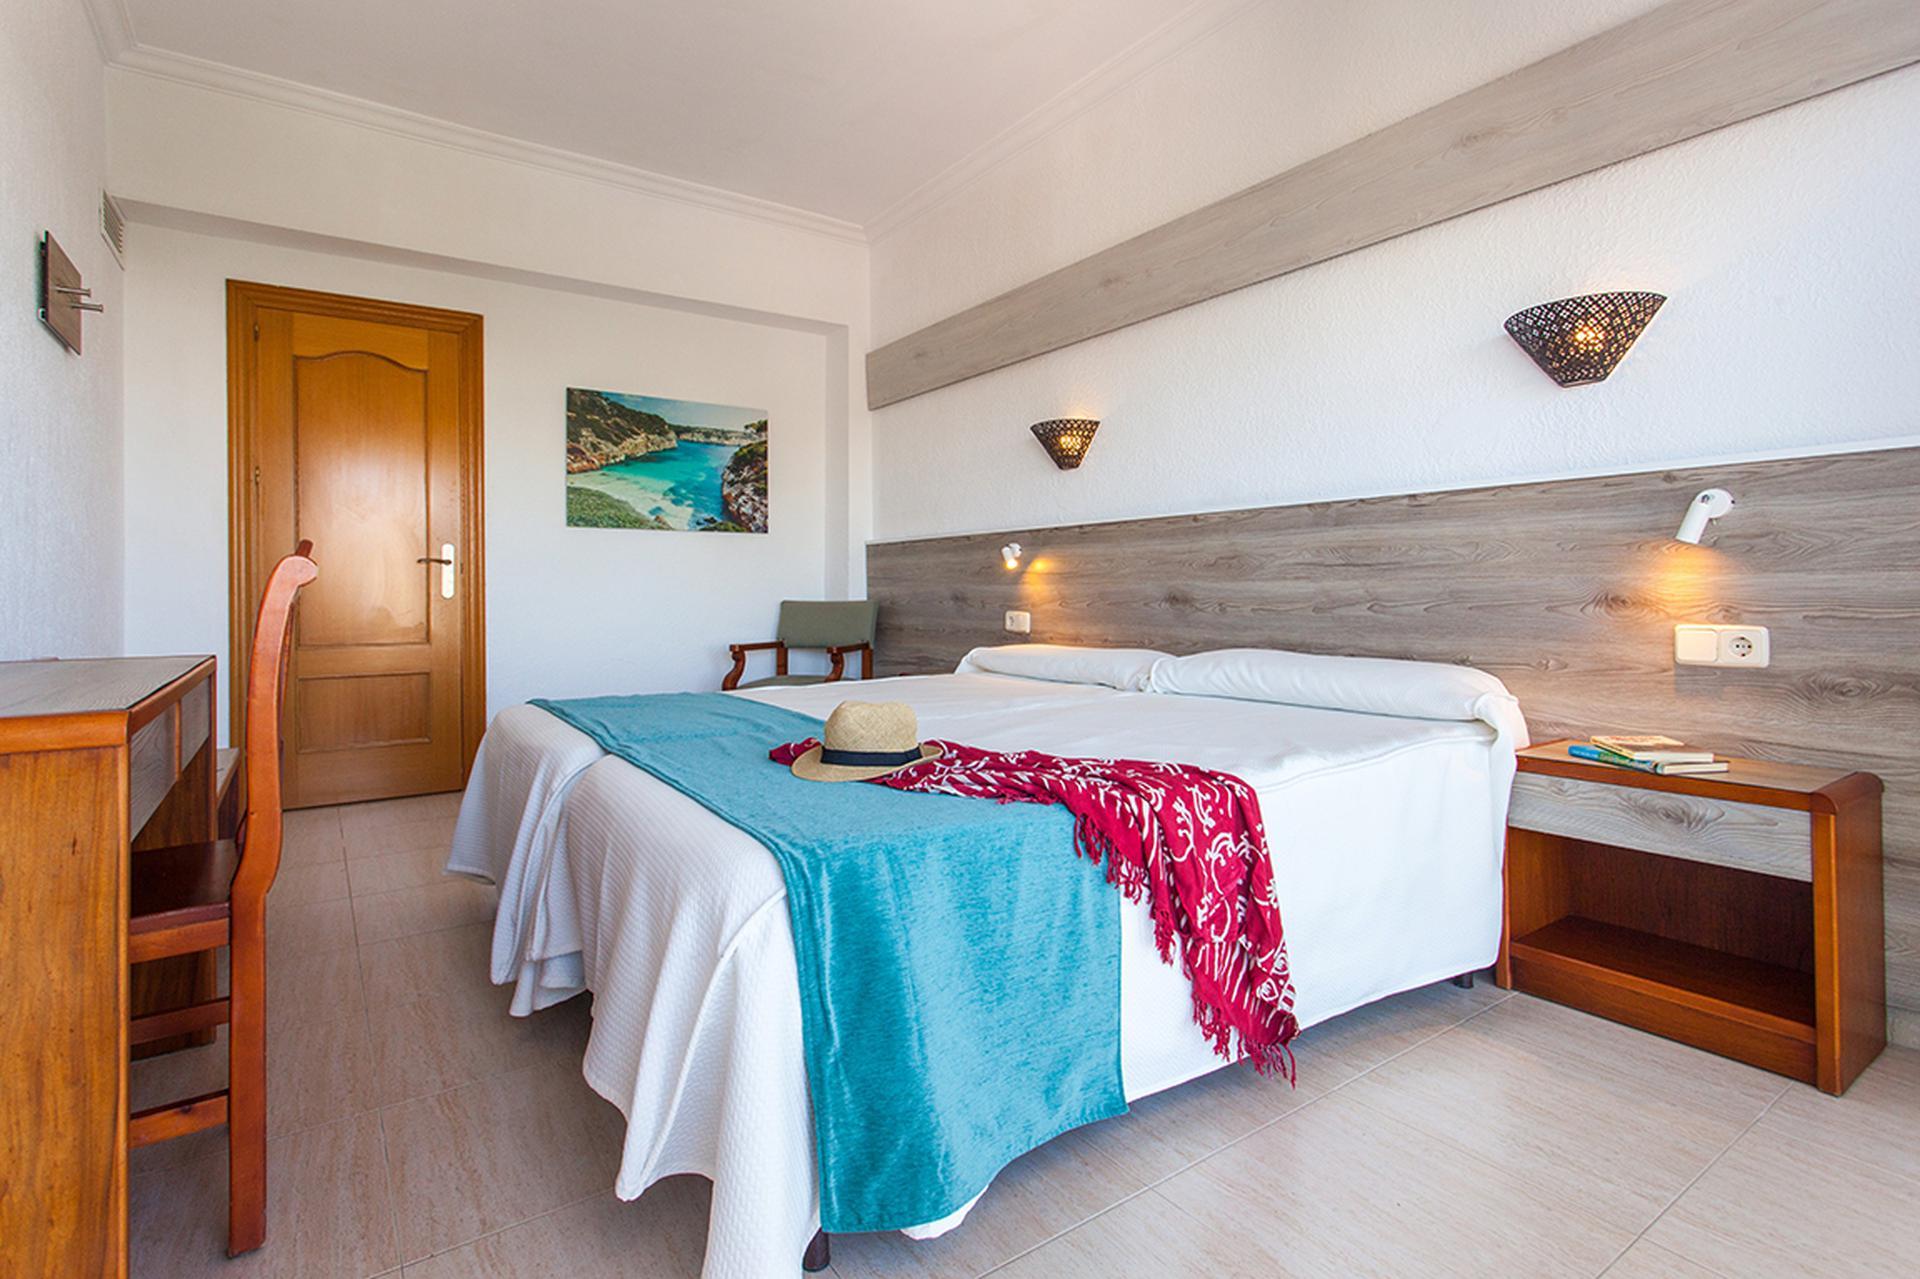 Appart Hotel Palma